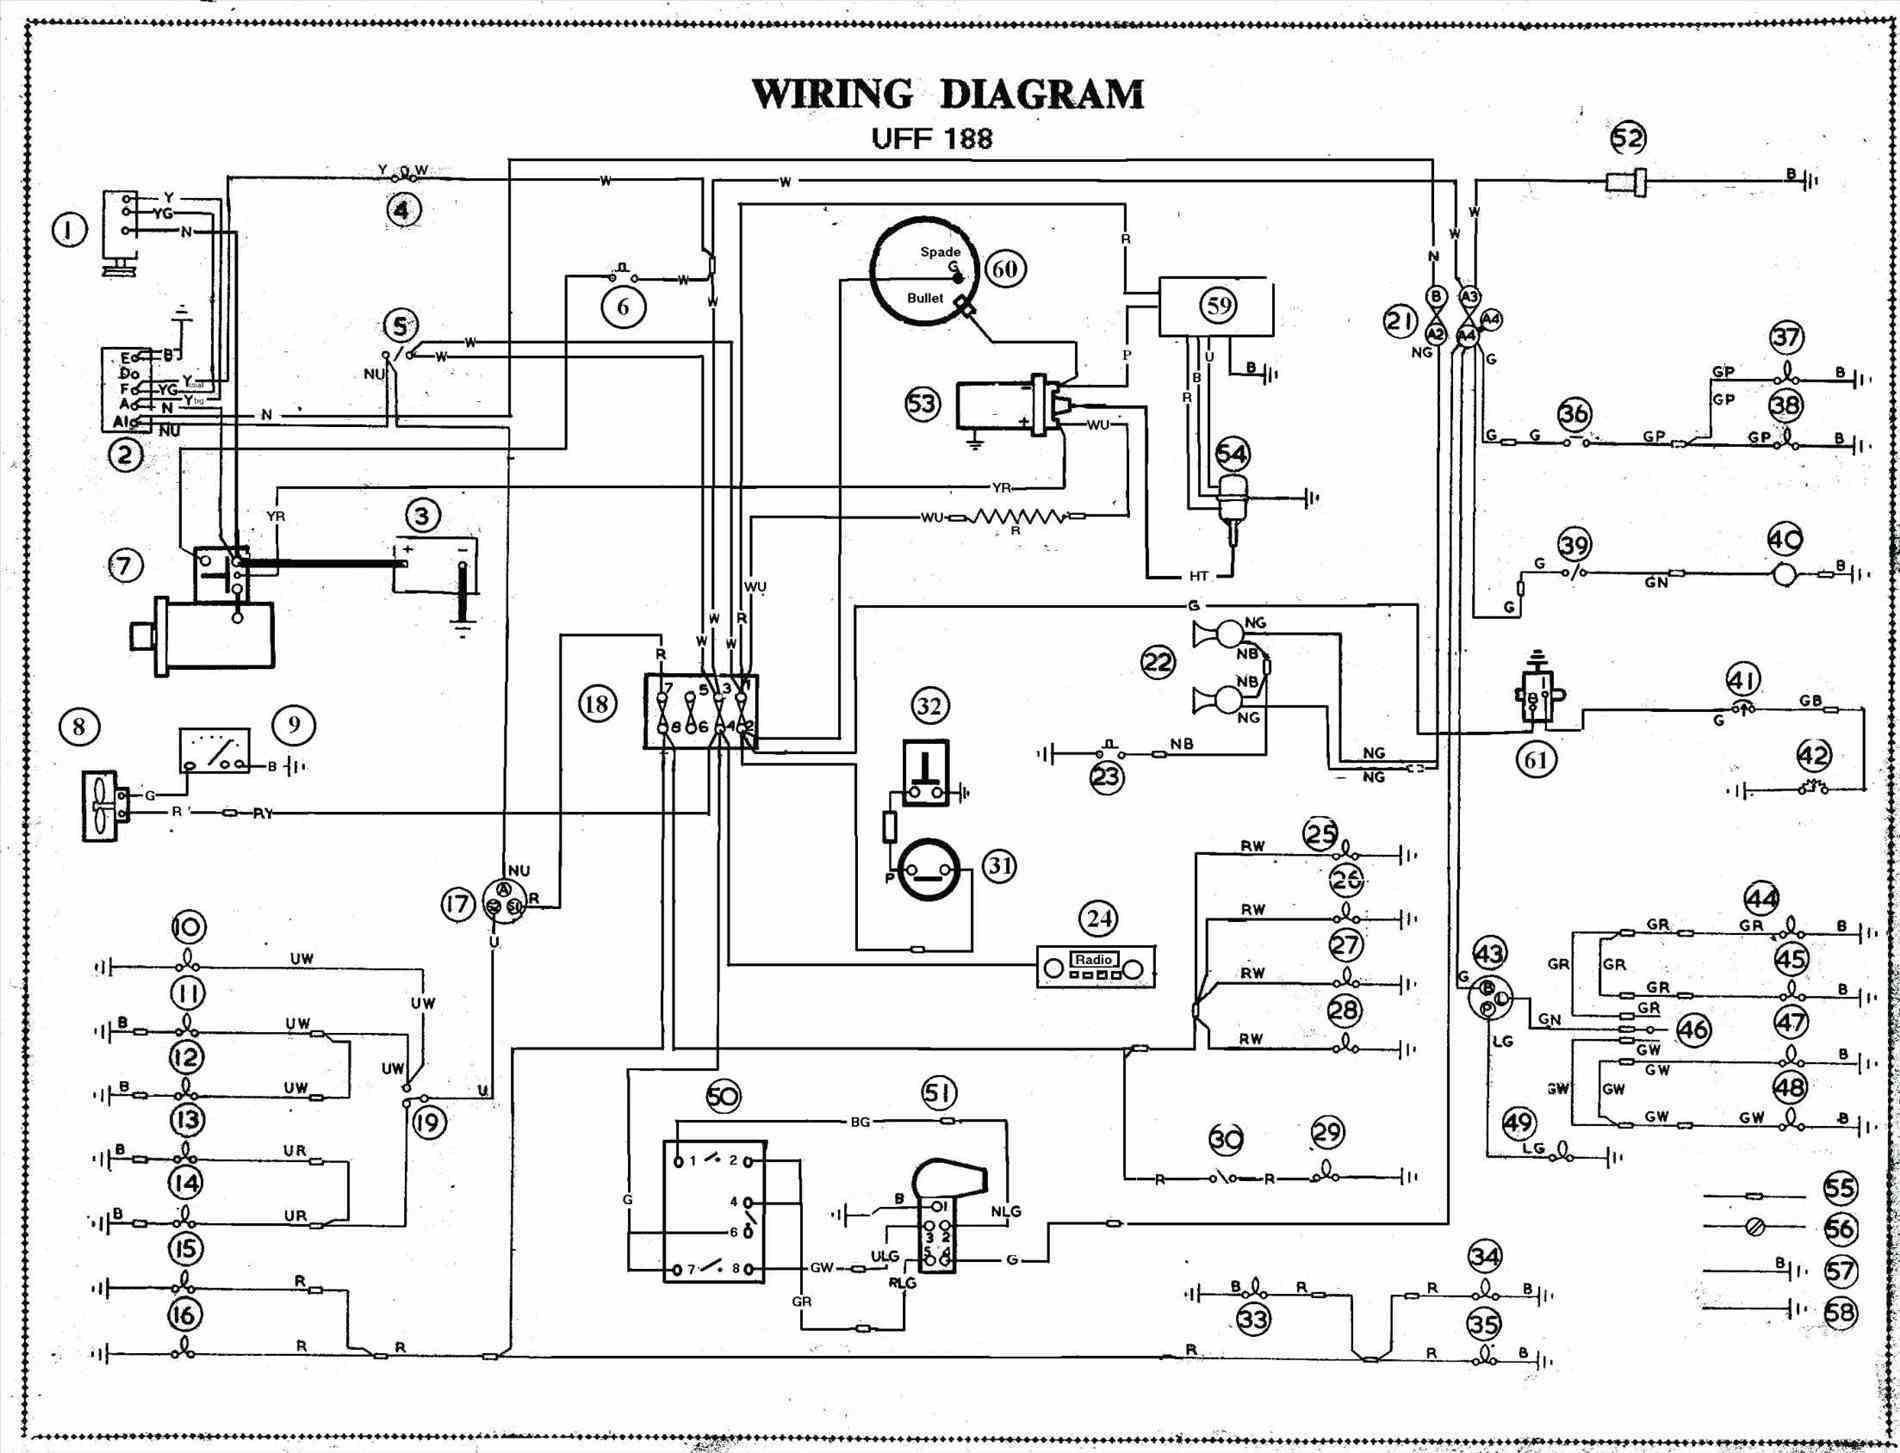 Vw Wiring Diagram Legend Valid Automotive Wiring Diagram Symbols Classic VW Beetle Diagrams Volkswagen Wiring Diagram